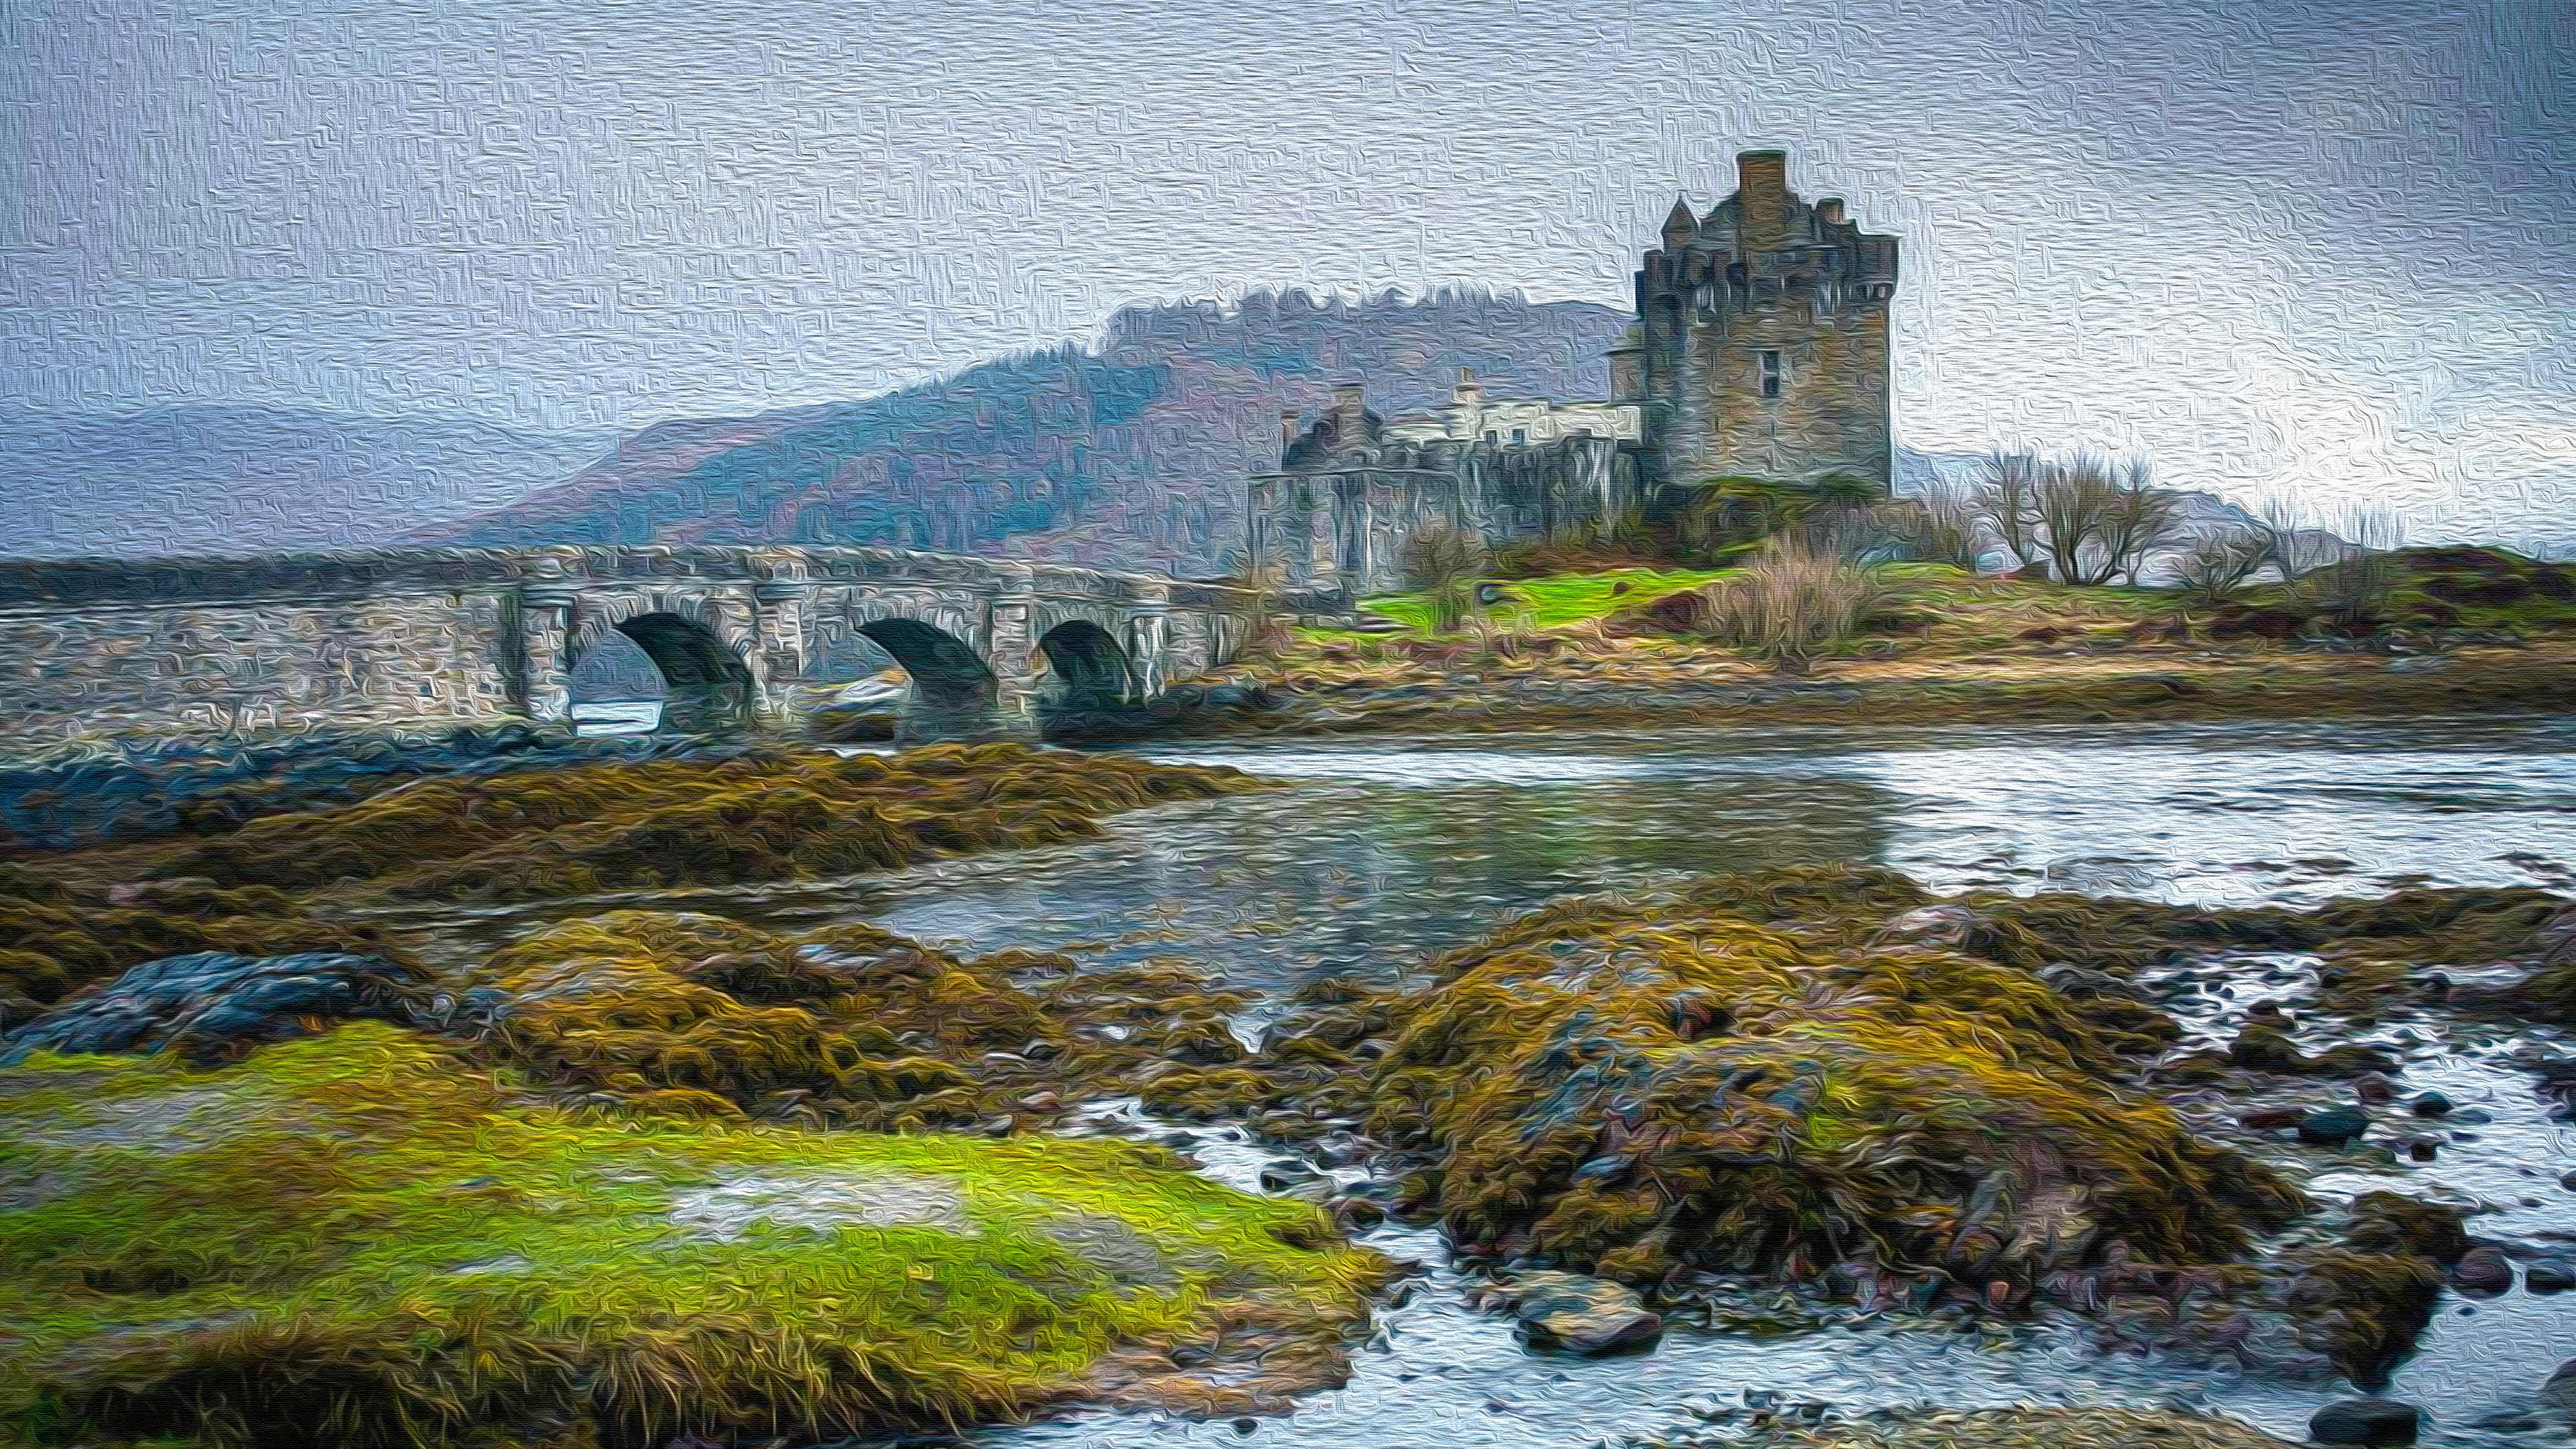 Bridge Castle Loch Duich Scotland 3840x2160